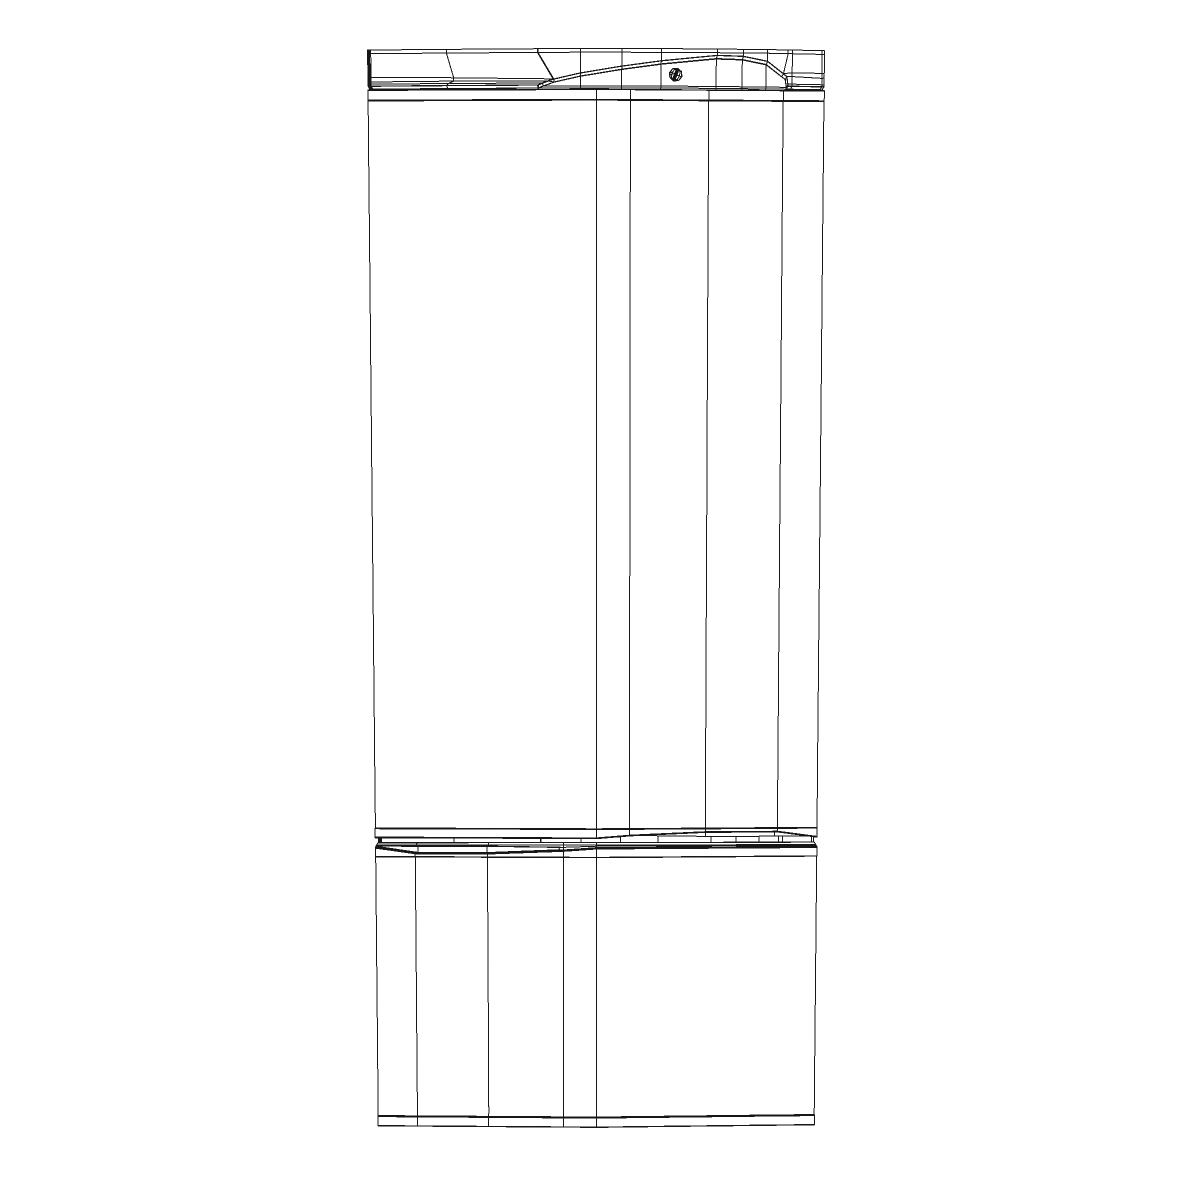 fridge 3d model 3ds max fbx ma mb obj 158911